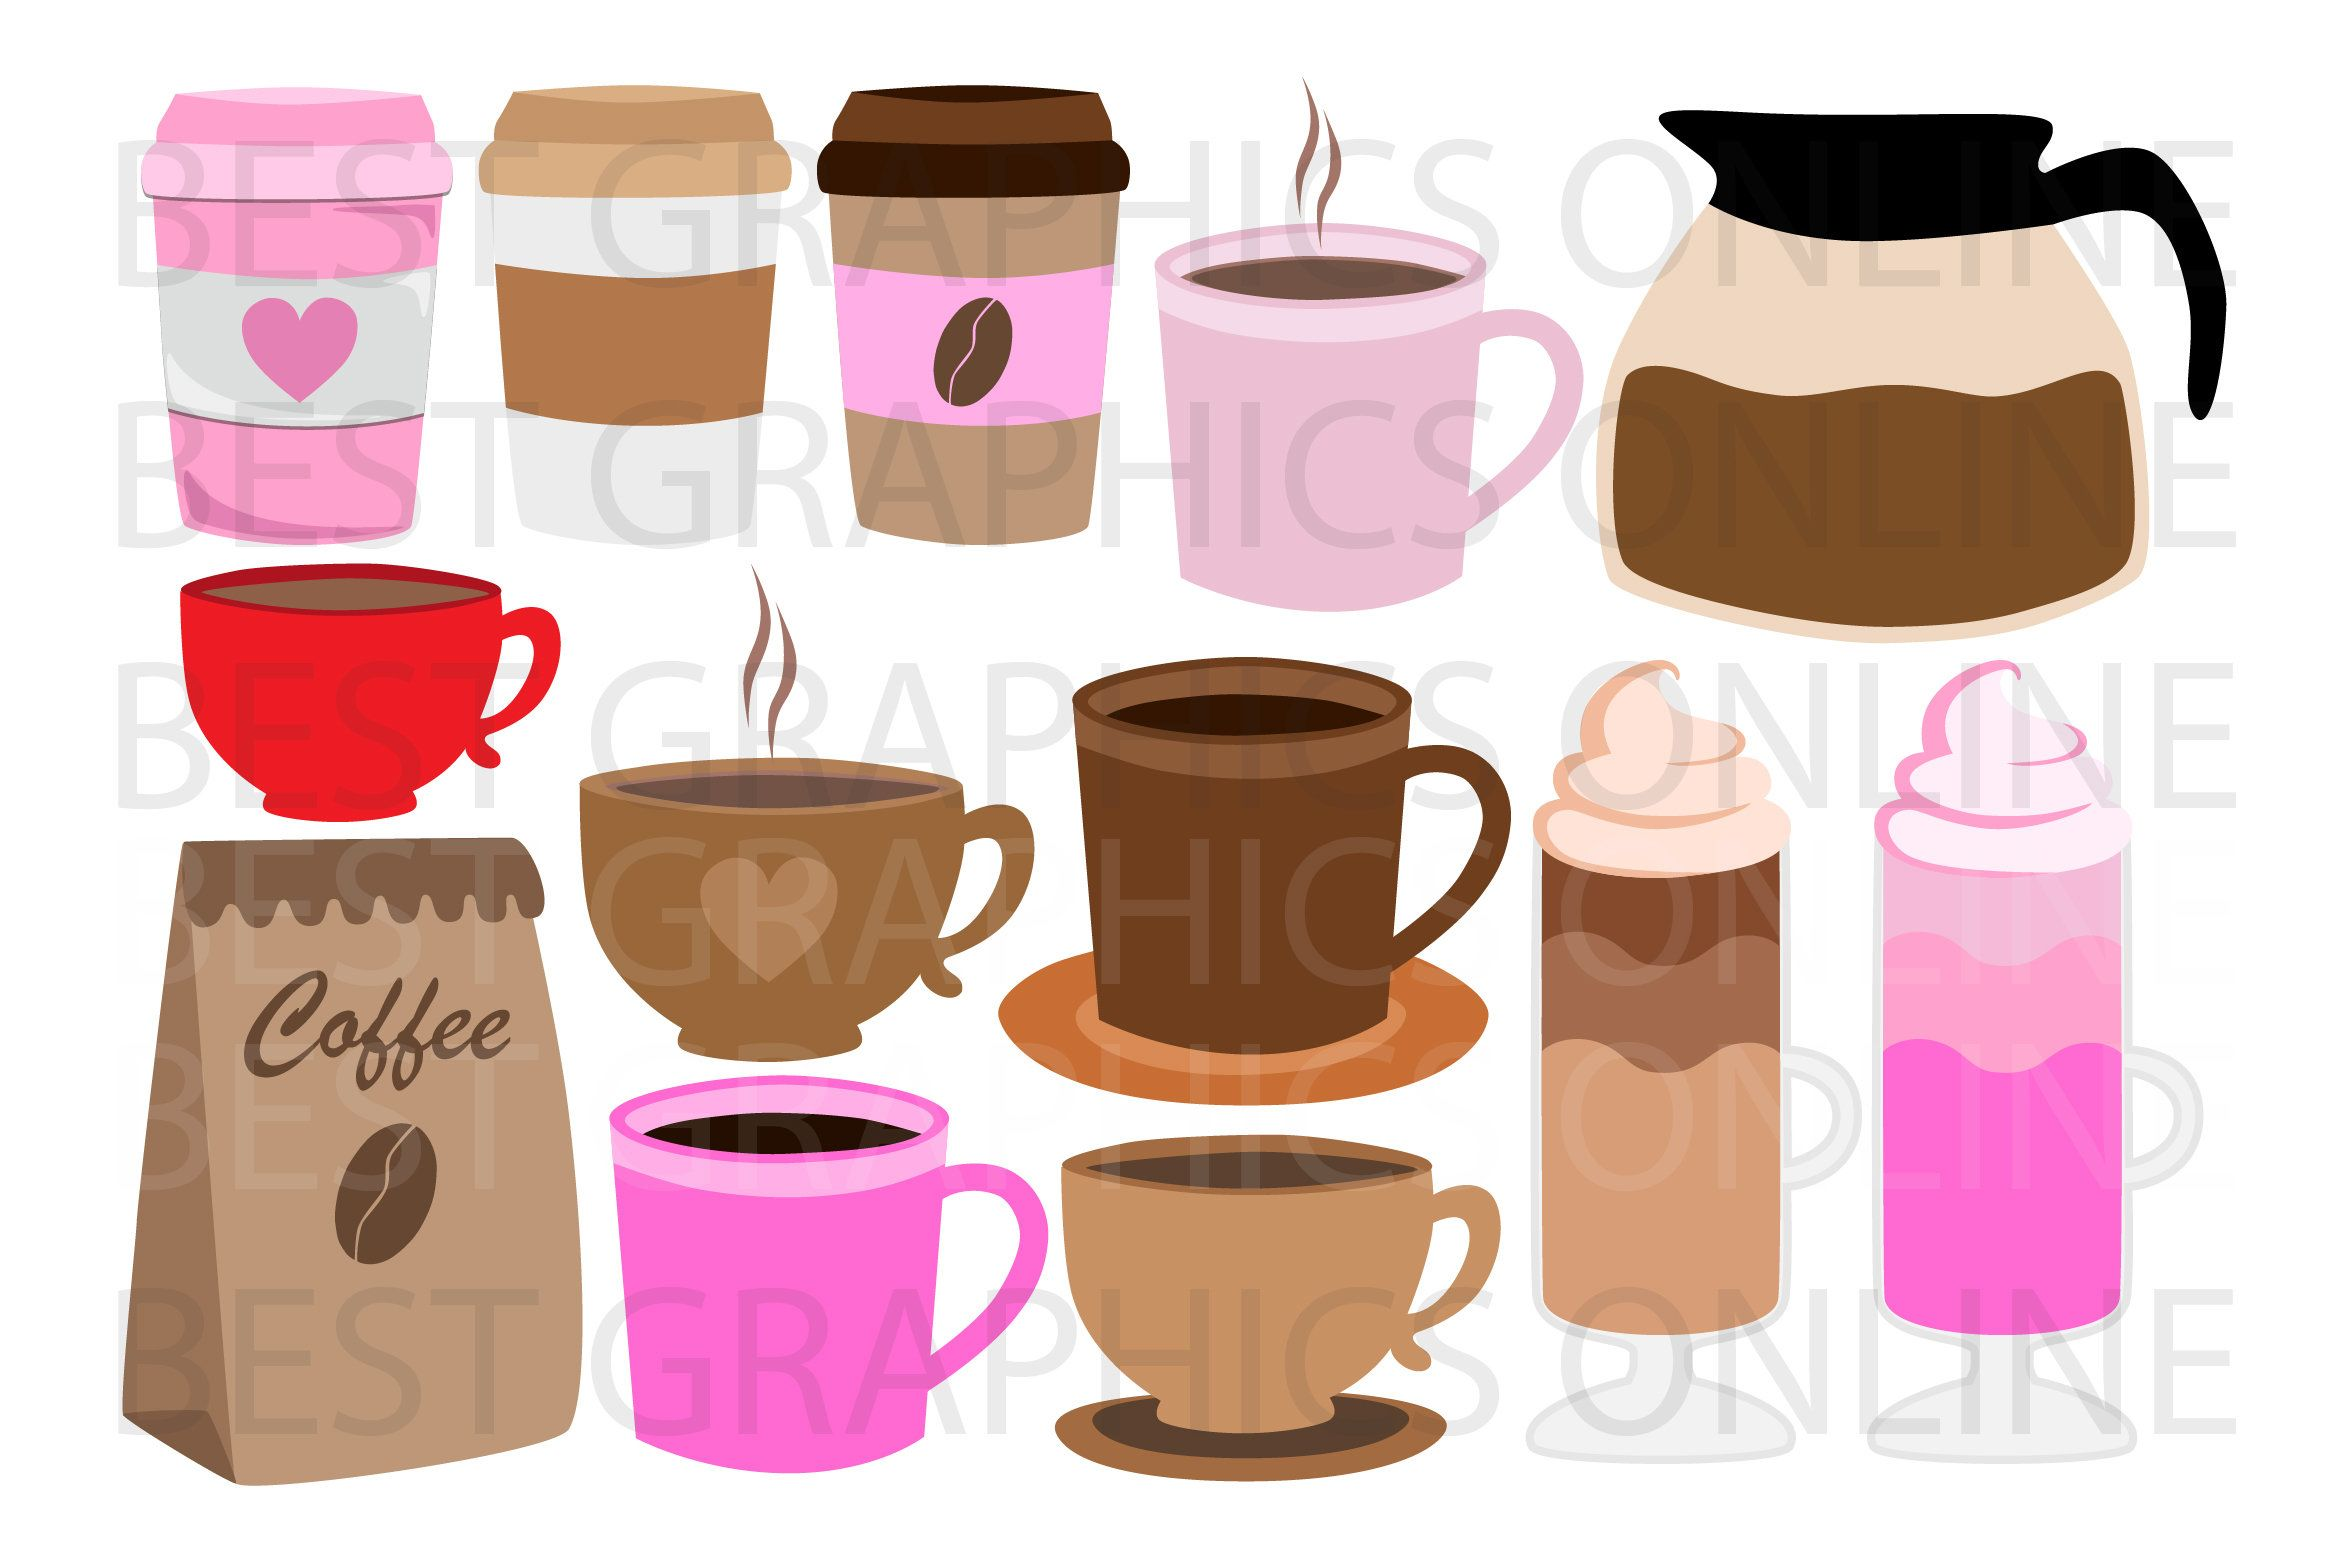 Coffee Clipart Digital Coffee Coffee Cups Coffee Mugs Latte